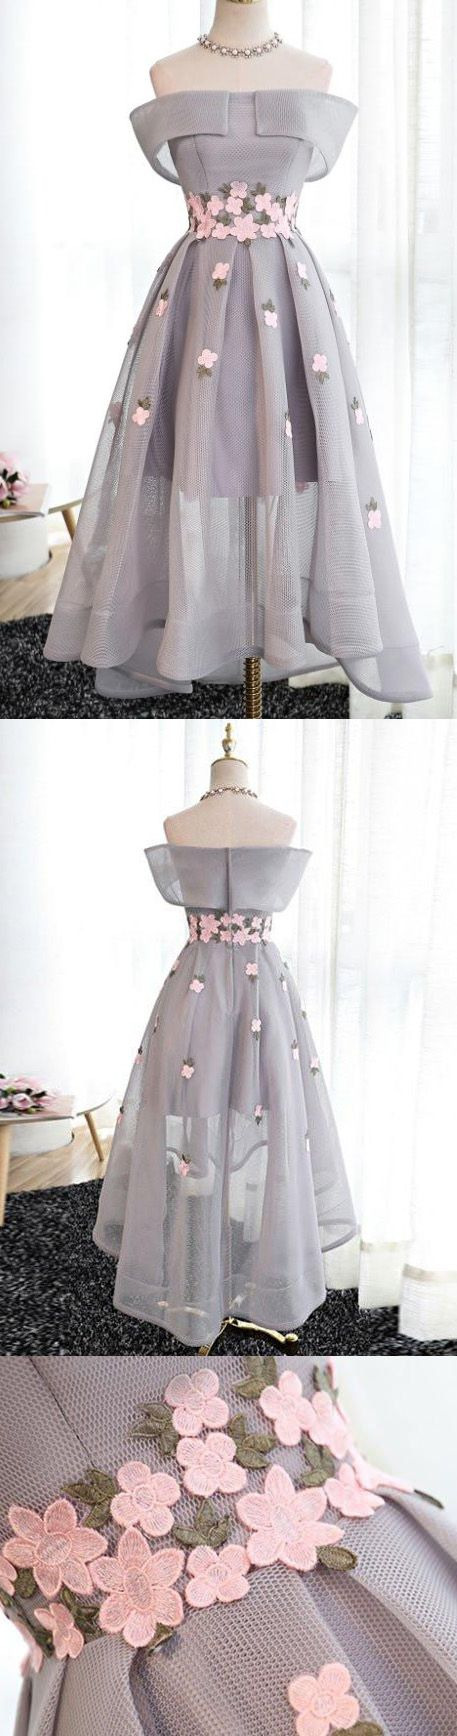 best nádherné šatybeautiful dresses images on pinterest